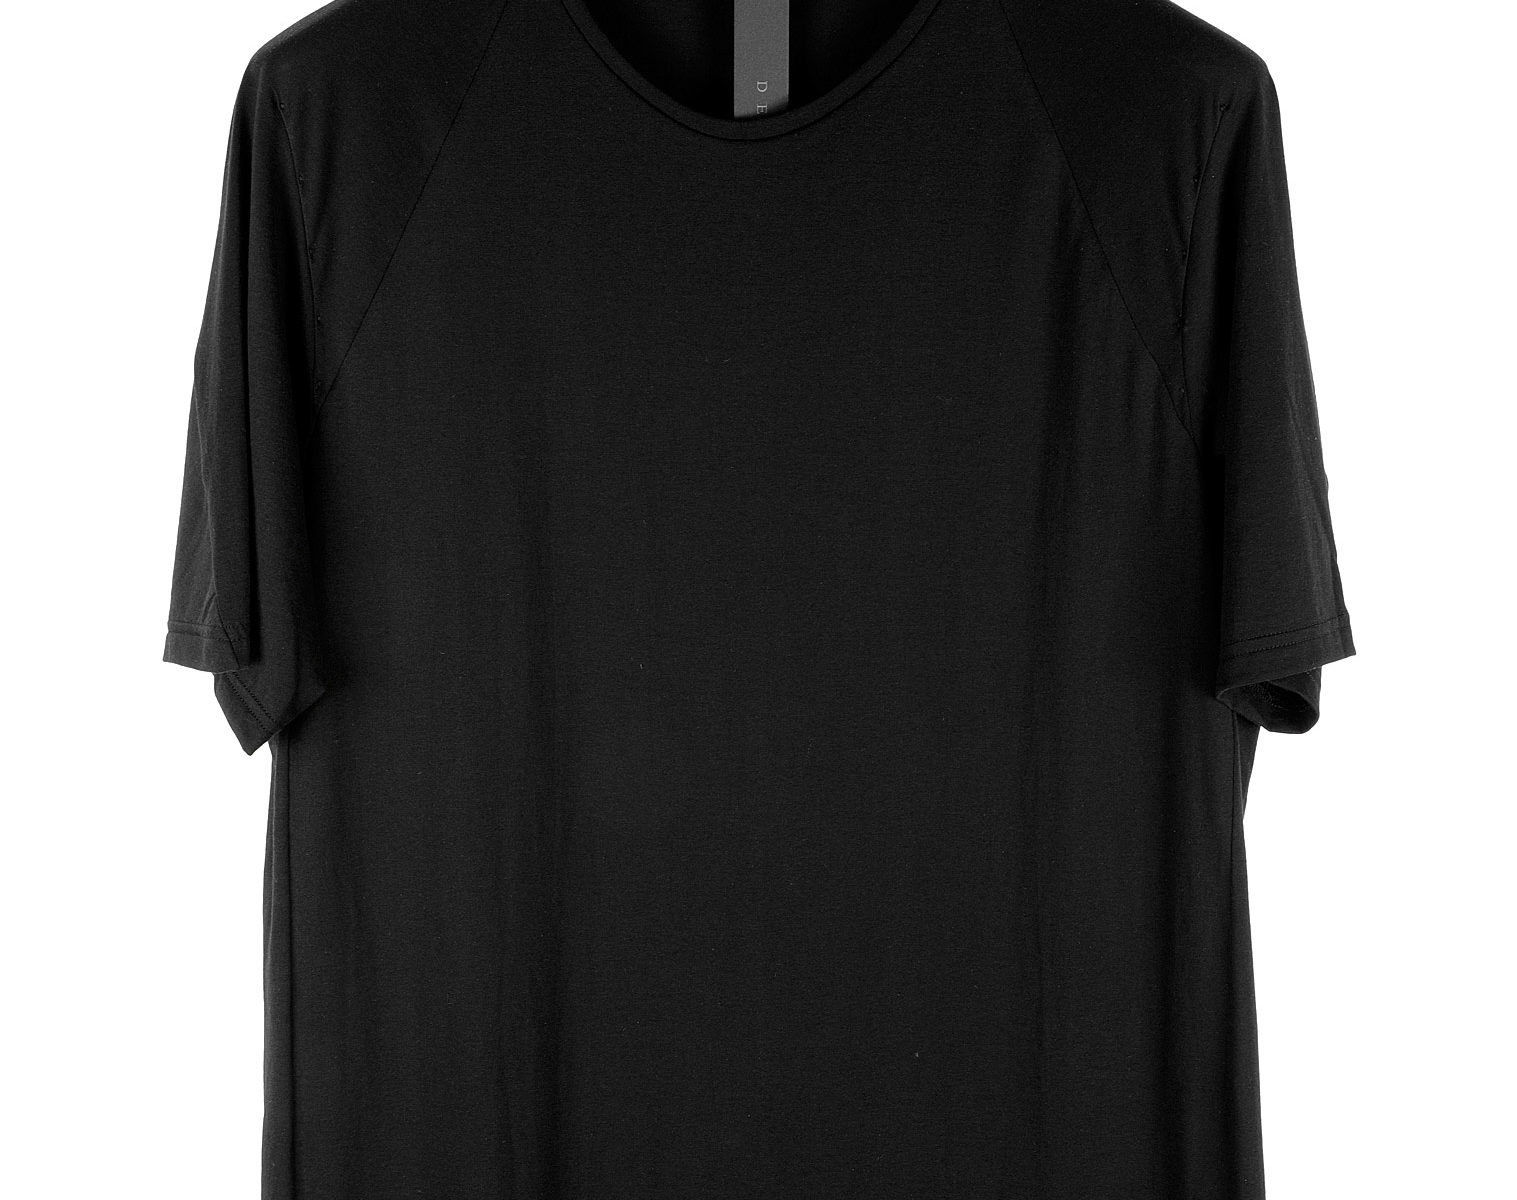 DEVOA Curved Hem T-Shirt 01